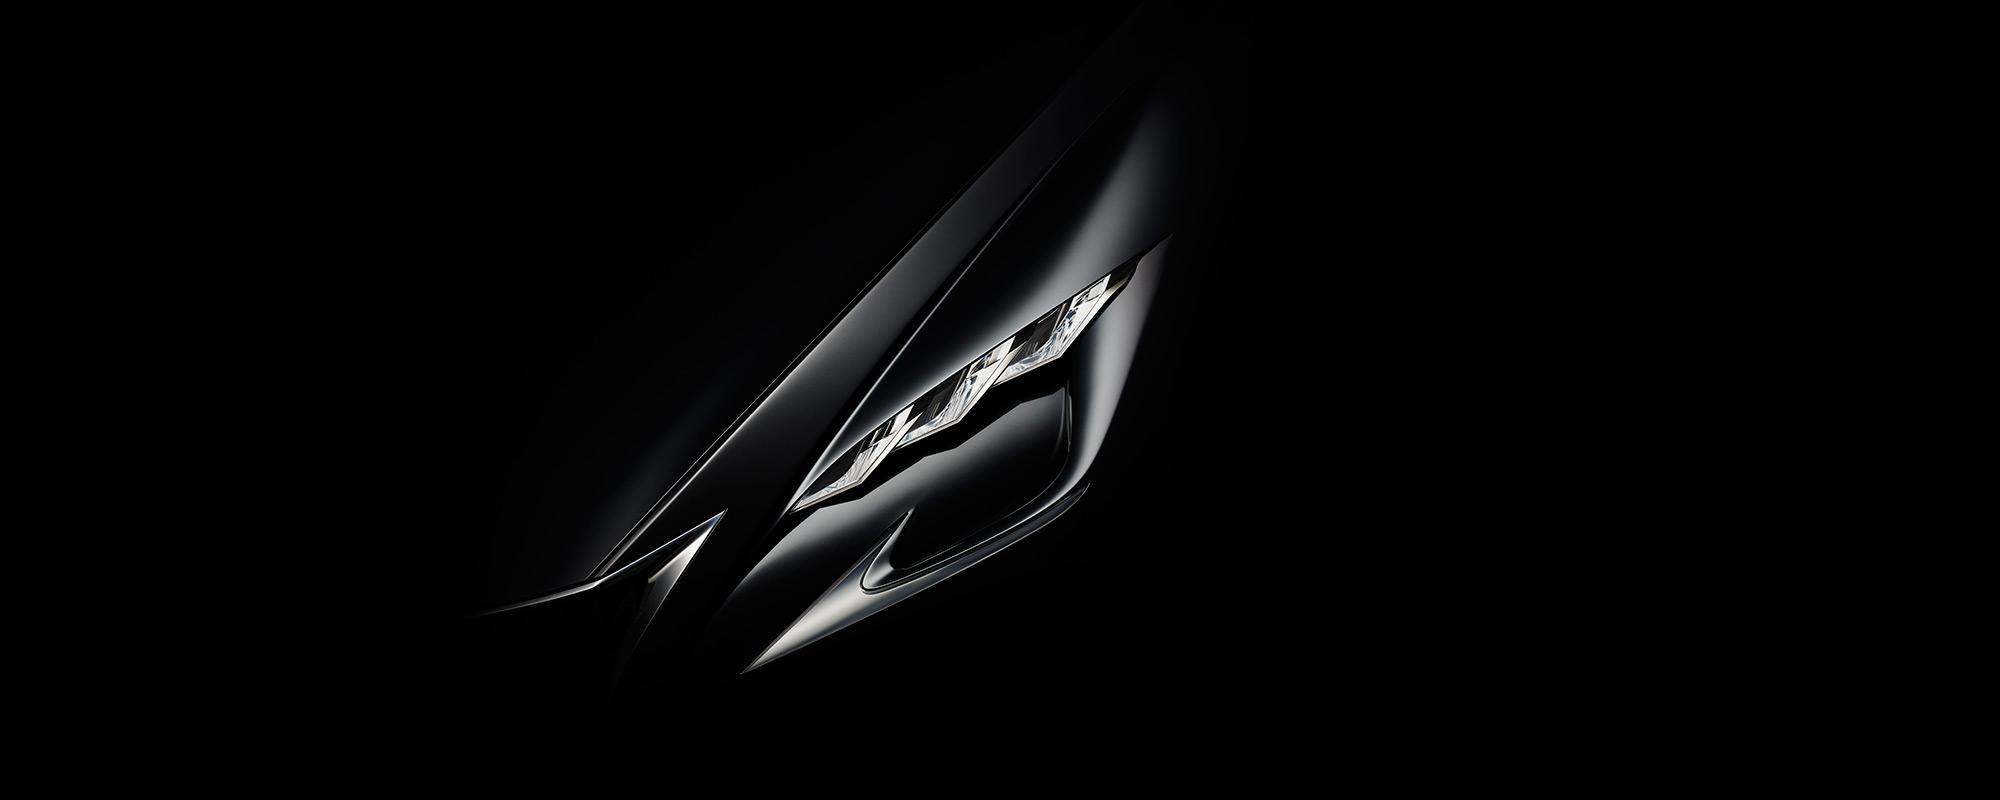 Lexus teast met spectaculaire conceptcar